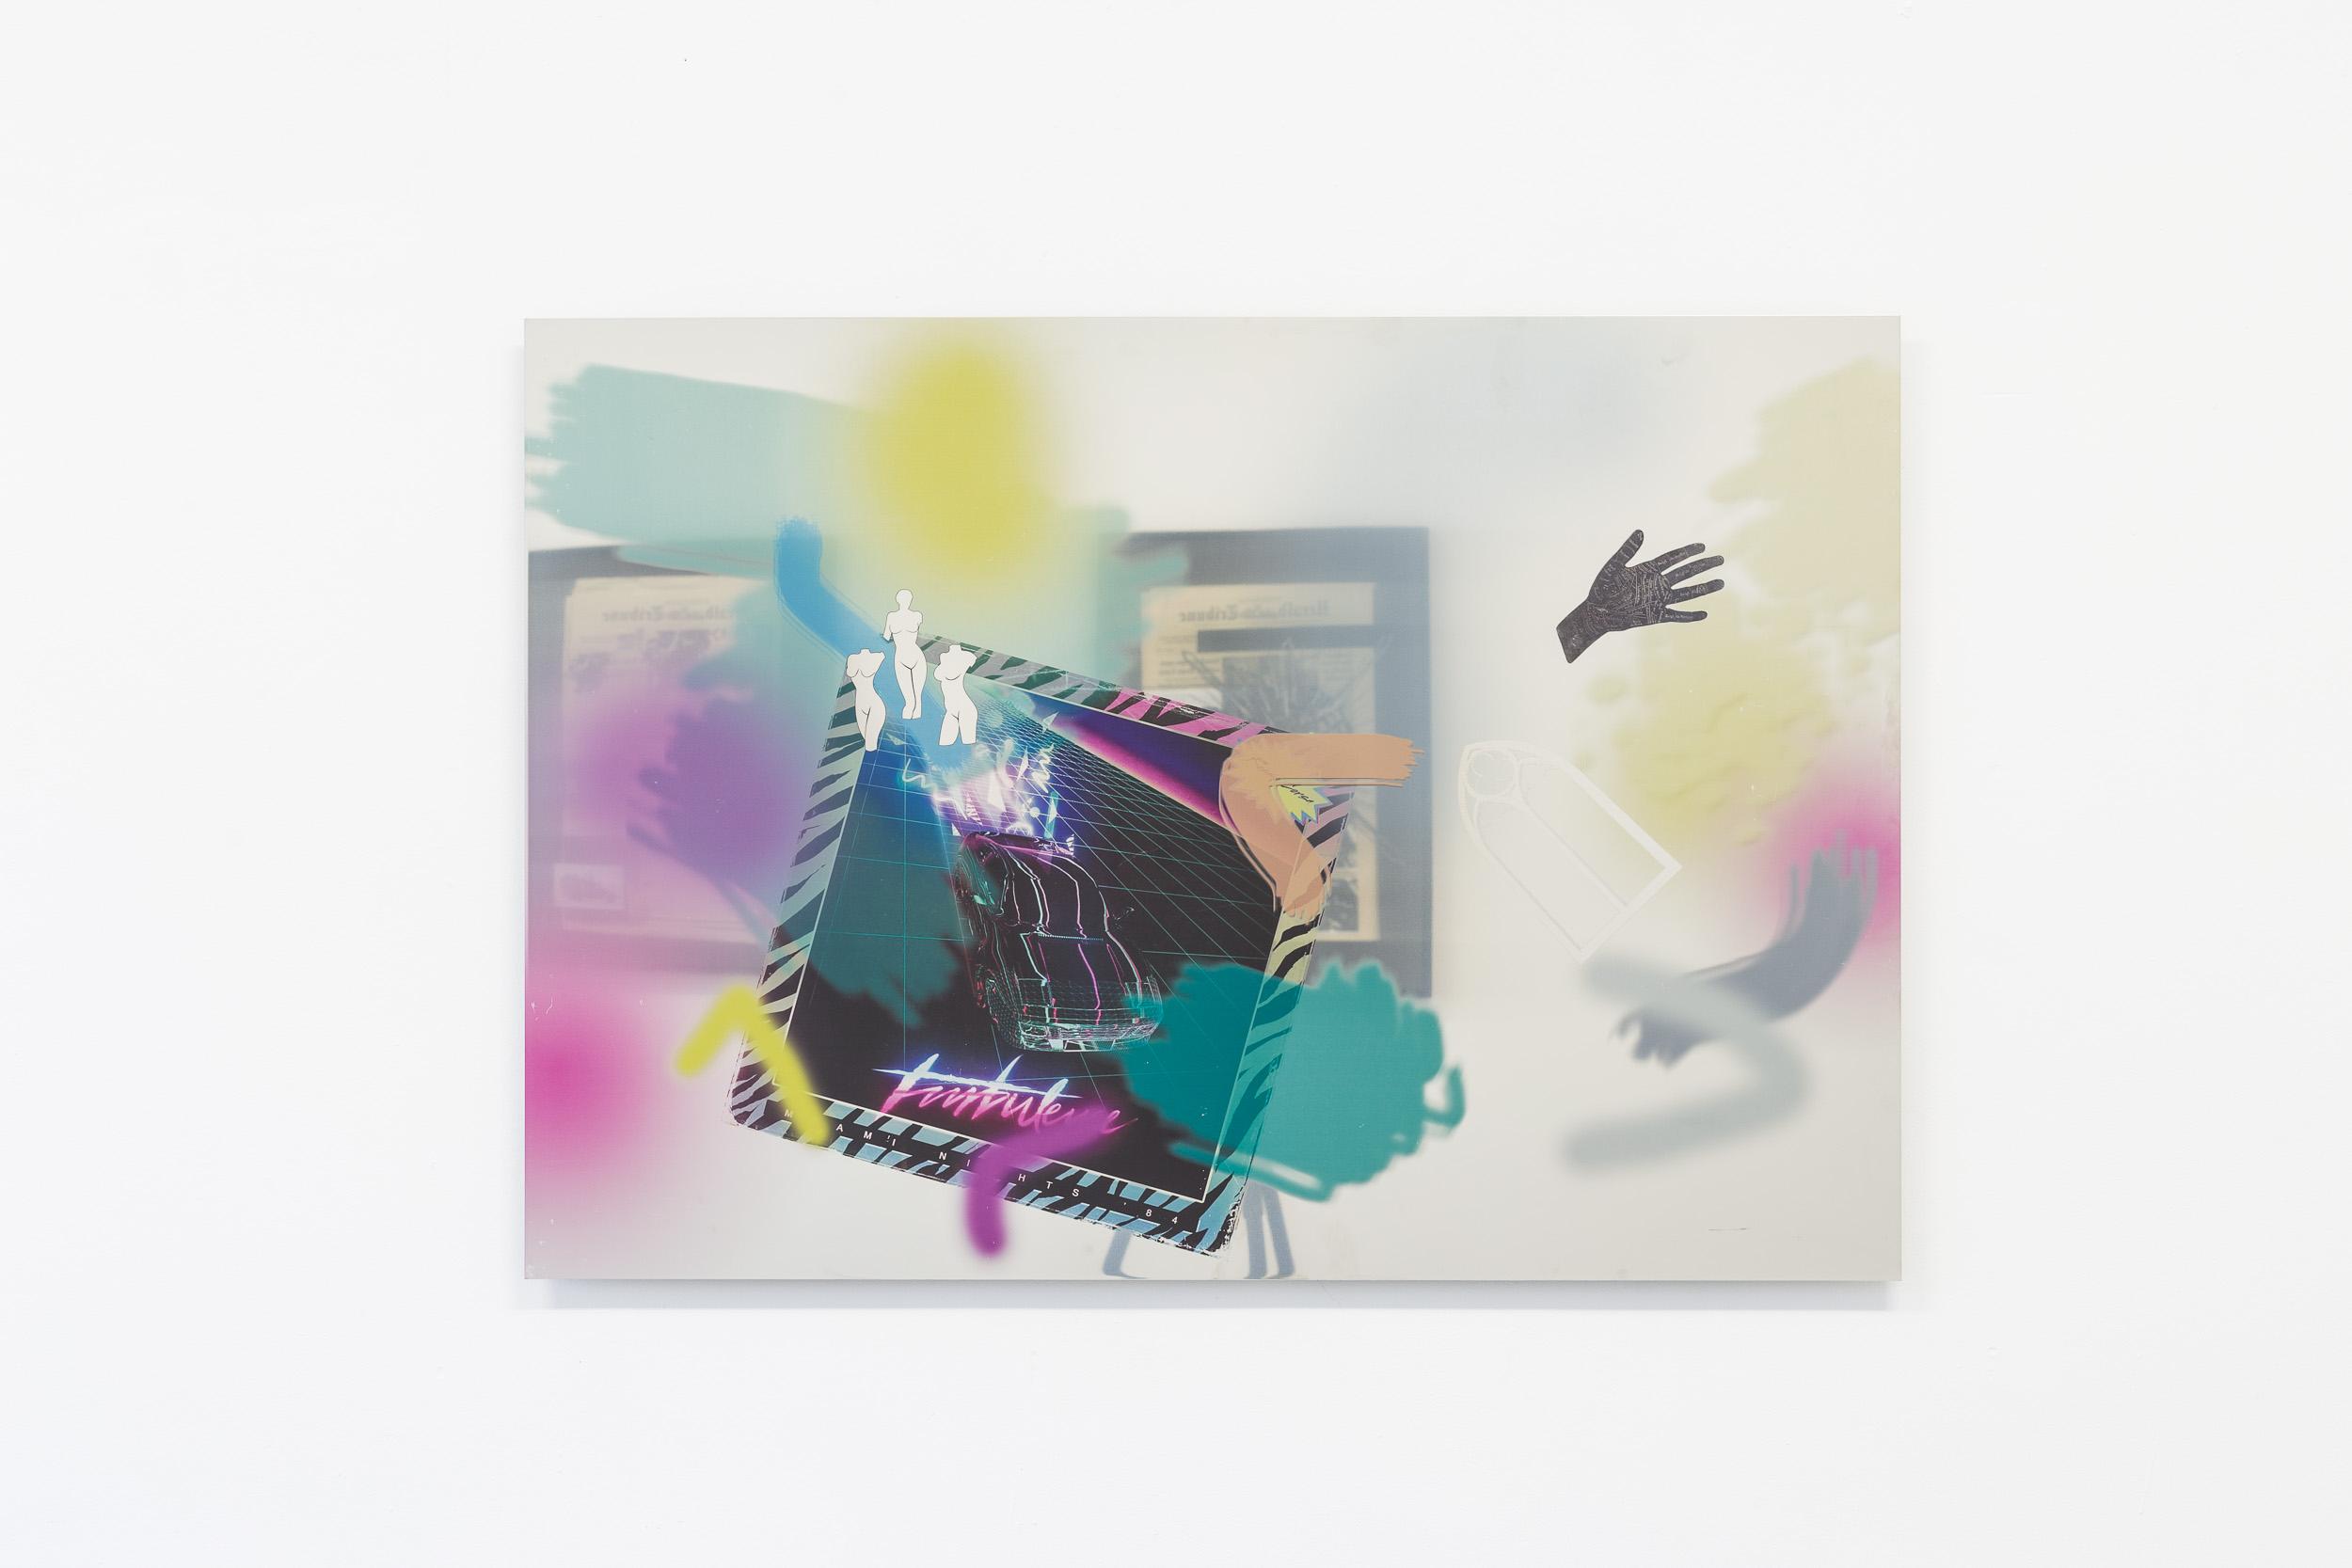 Matyas Chochola,    MIAMI NIGHTS VOL.2   ,   2016  ,   Print on stainless steel  ,   100 × 80 cm Photo: Kilian Bannwart